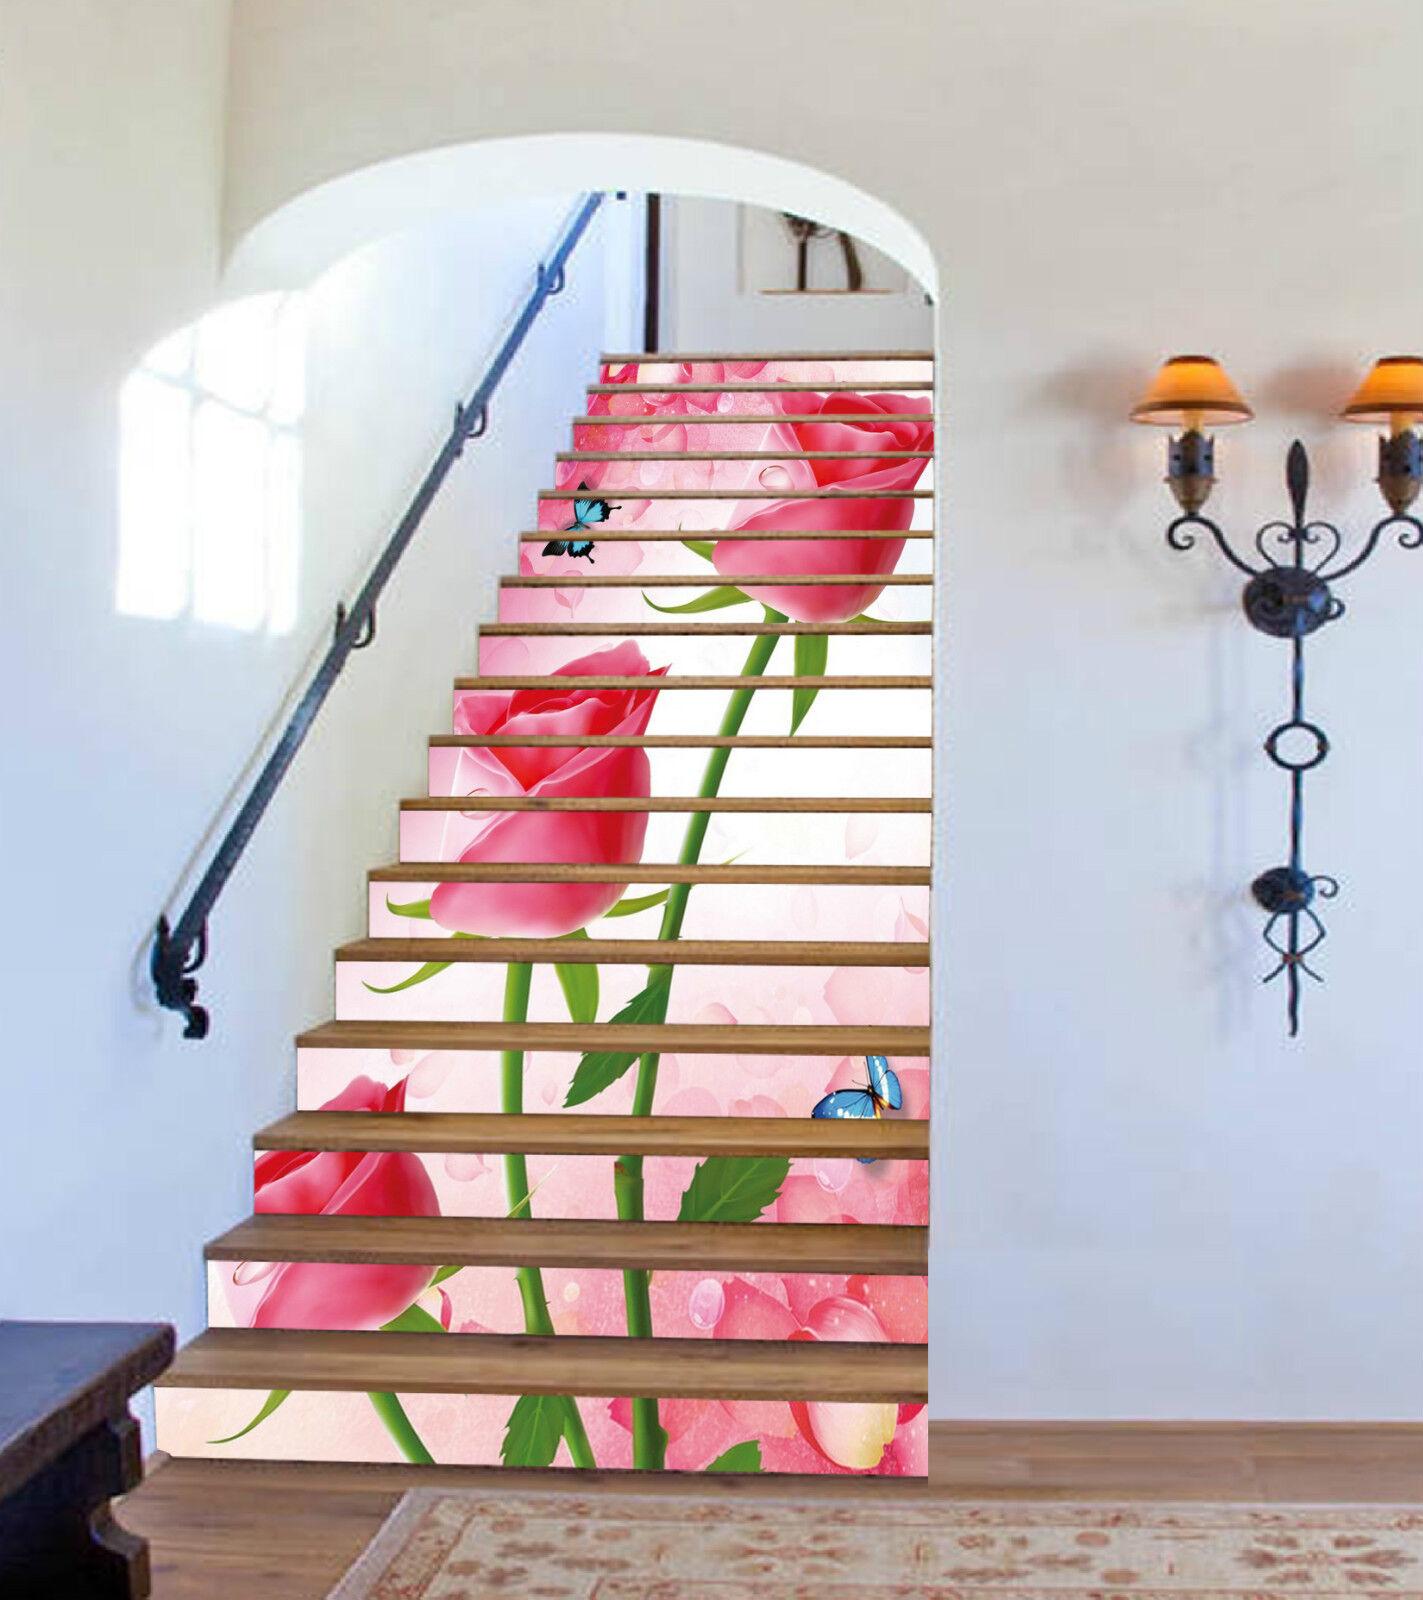 3D pink pinkn 218 Stair Risers Dekoration Fototapete Vinyl Aufkleber Tapete DE